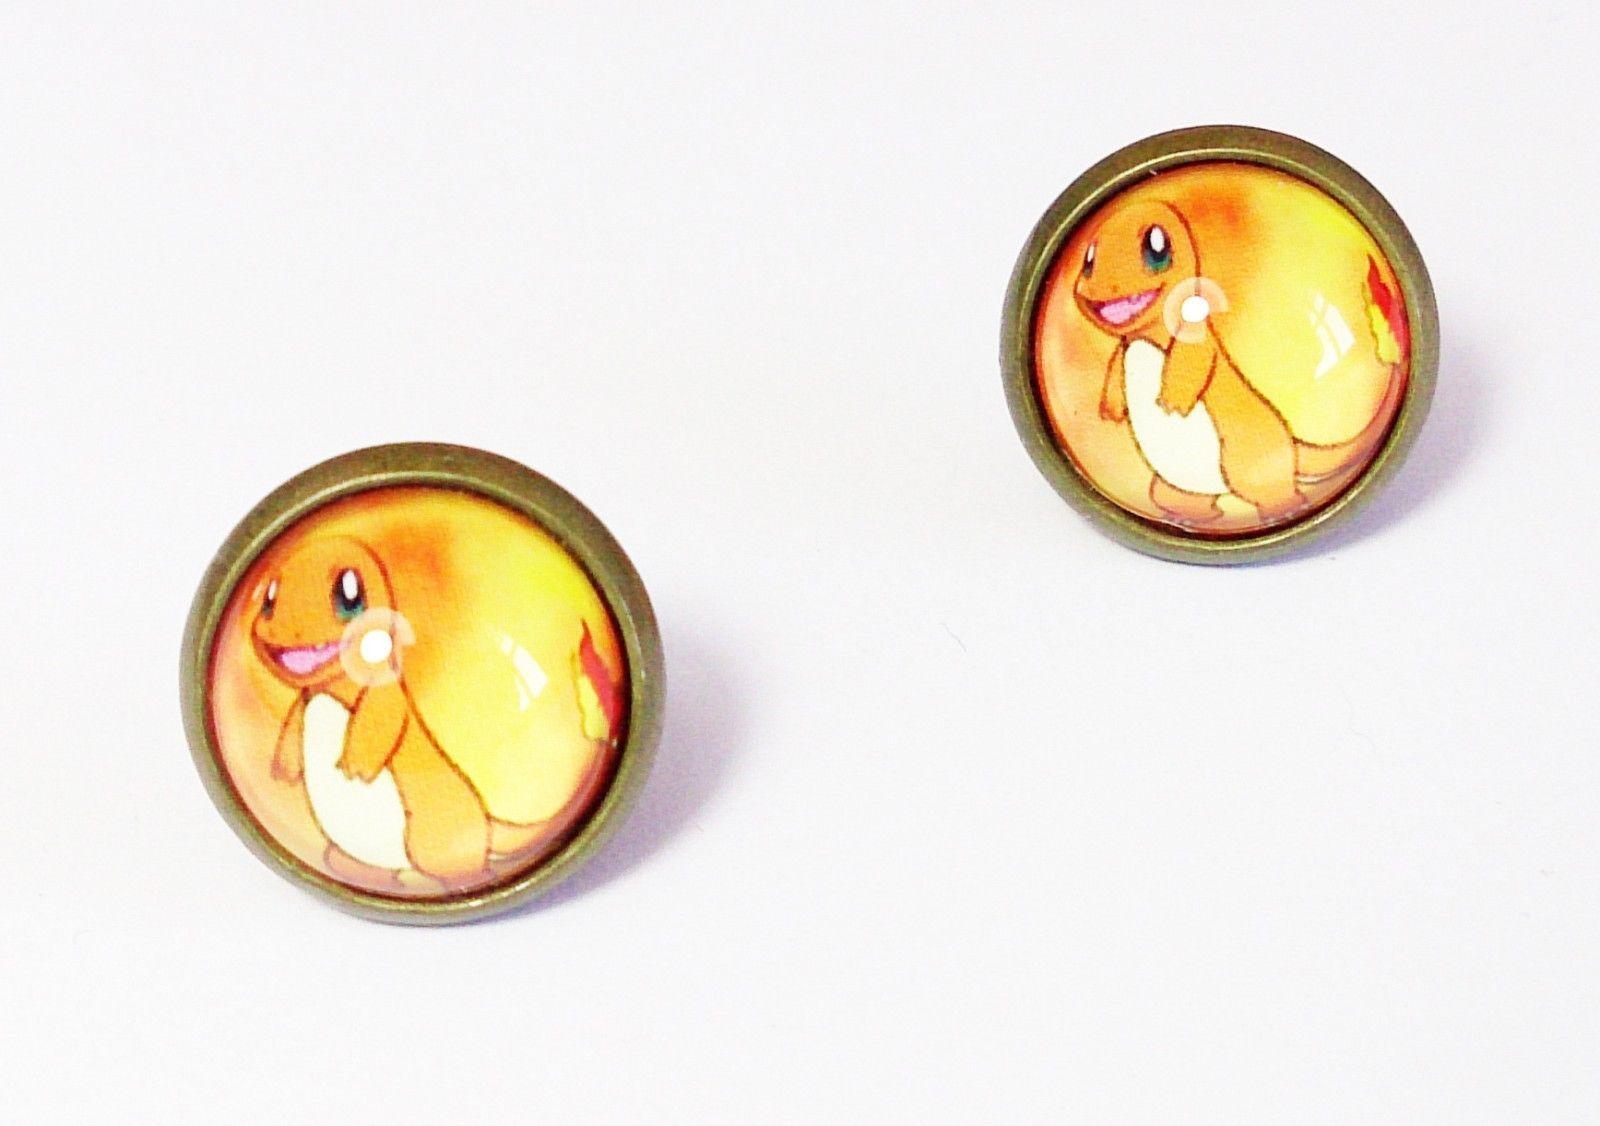 Japan Anime Pokemon Pikachu Stud Earrings Pokédex Manga Cosplay Cute Jewelry